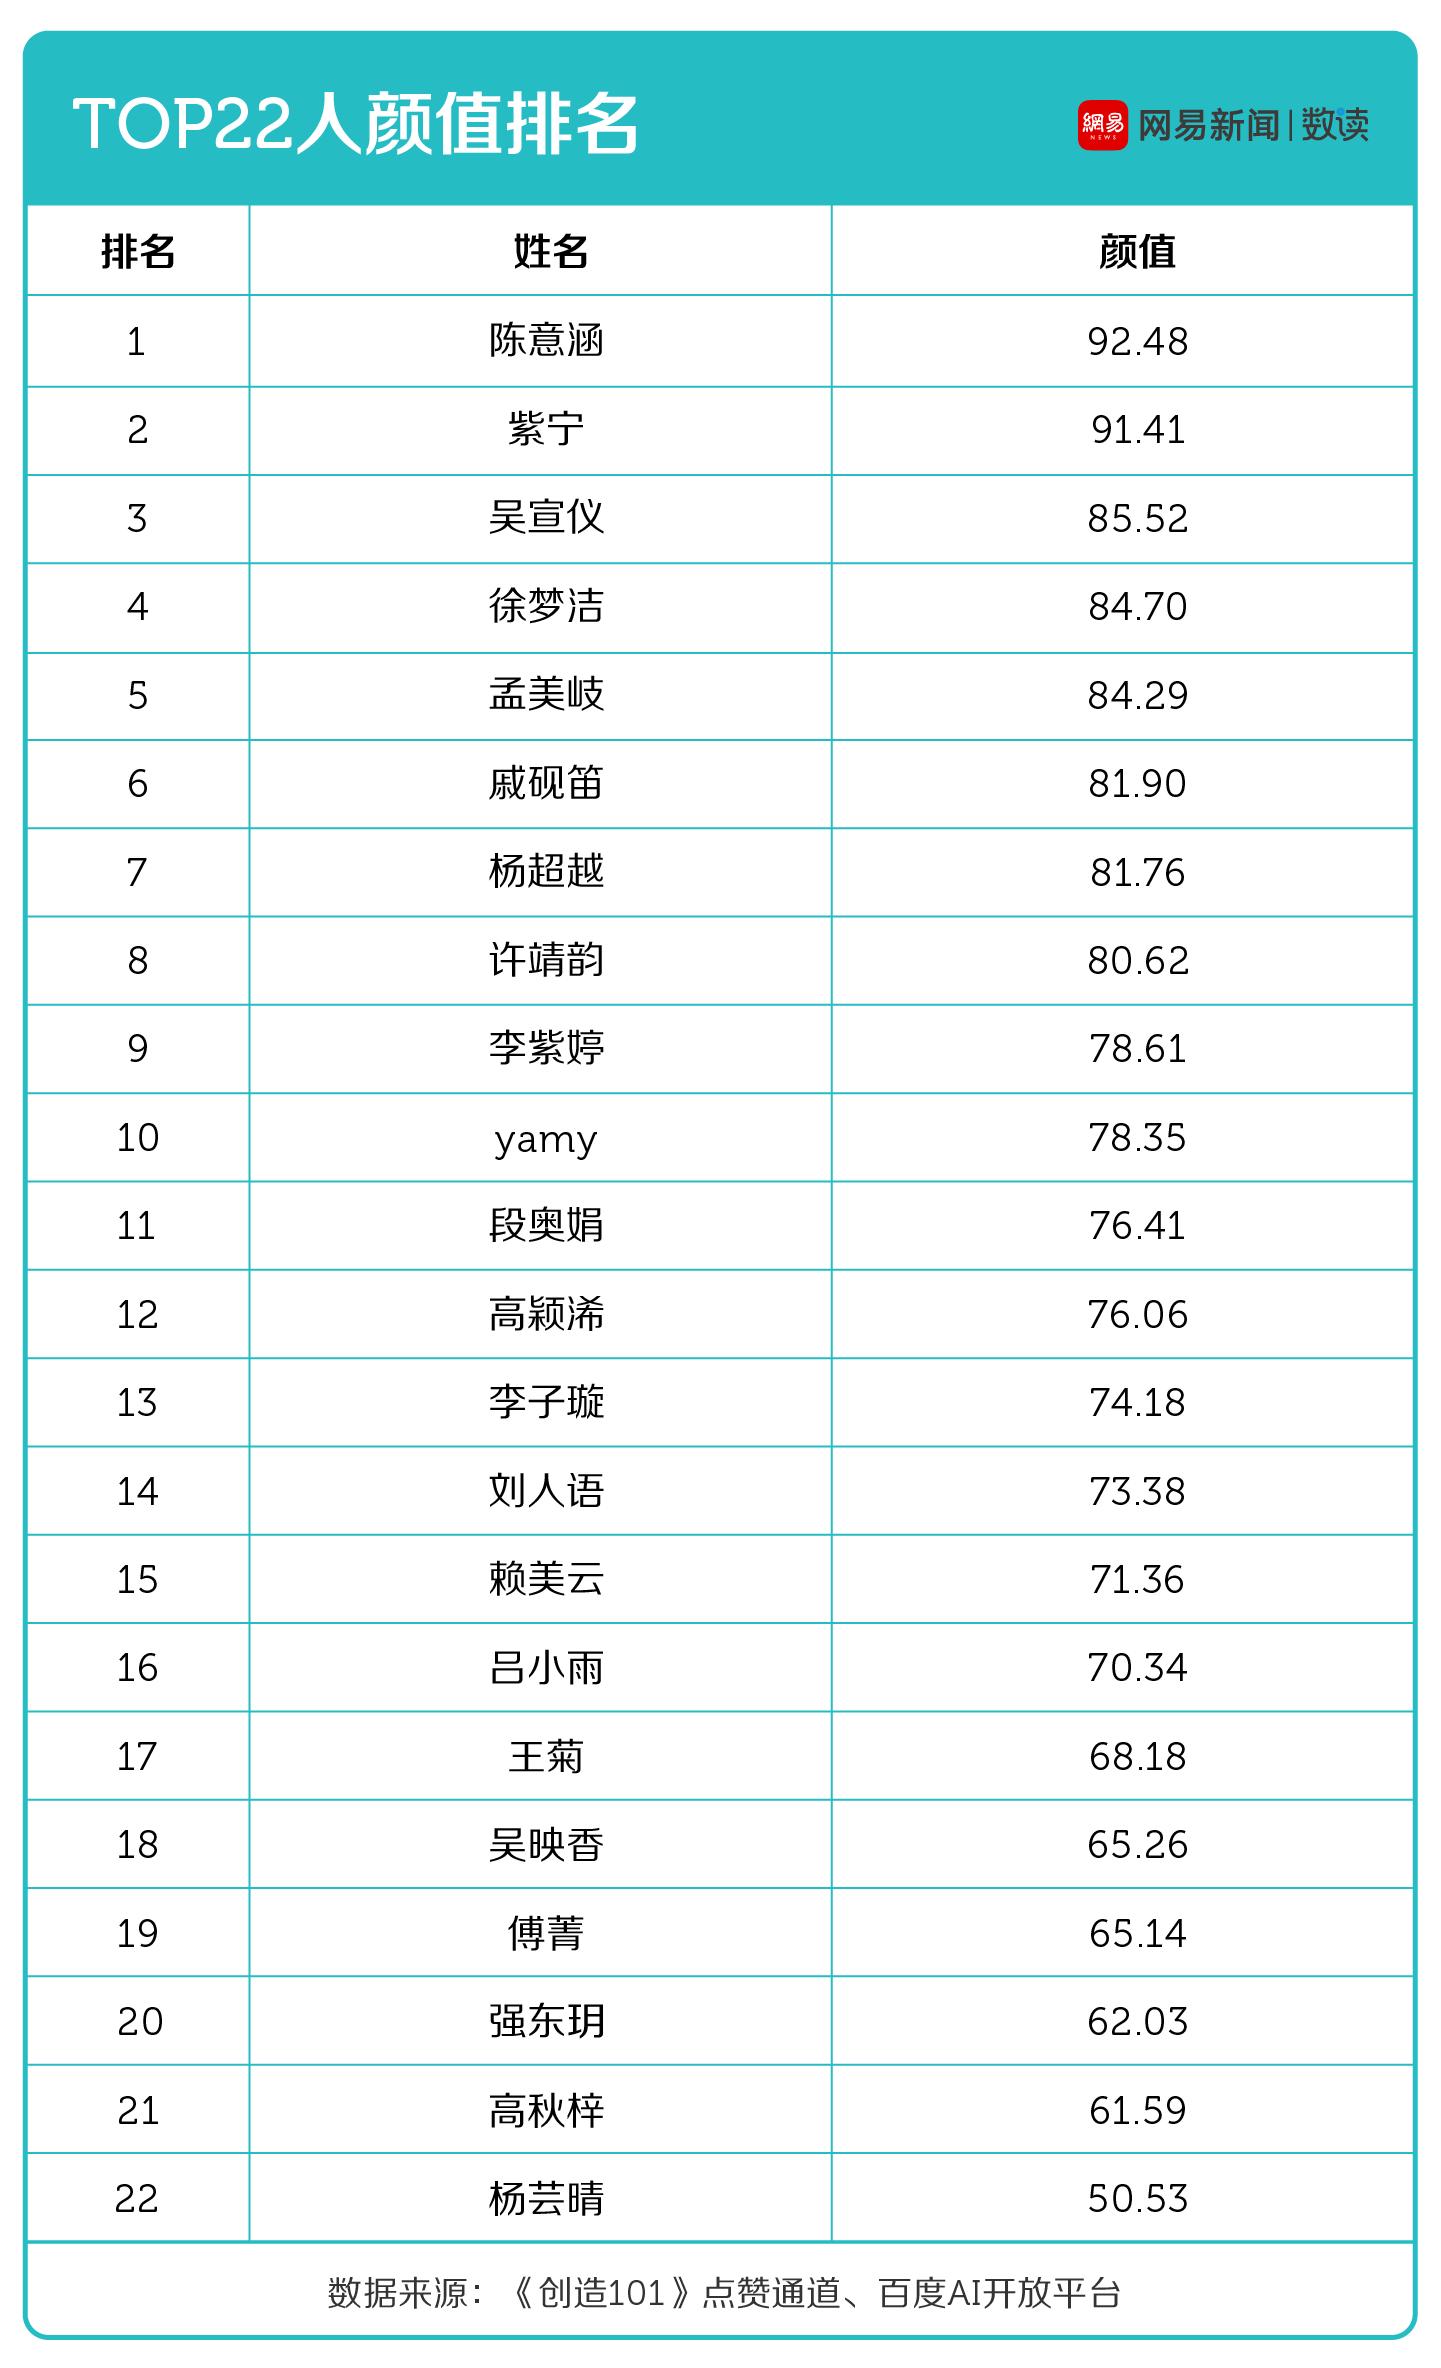 Top22选手颜值排名